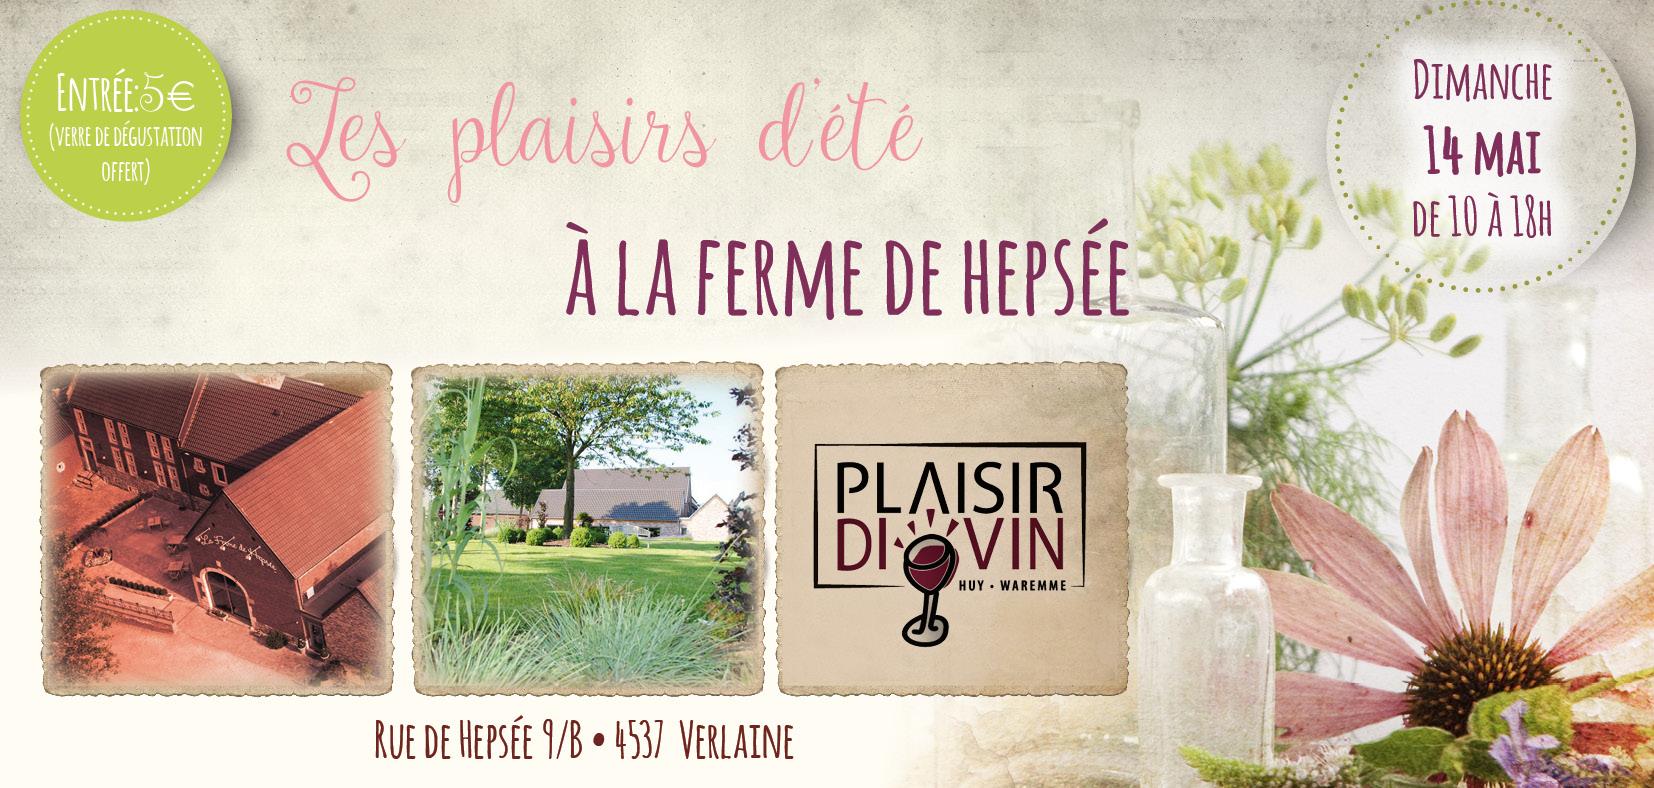 Meuble Salle De Bain Huy ~ verlaine plaisir di vin organise ses portes ouvertes verlaine